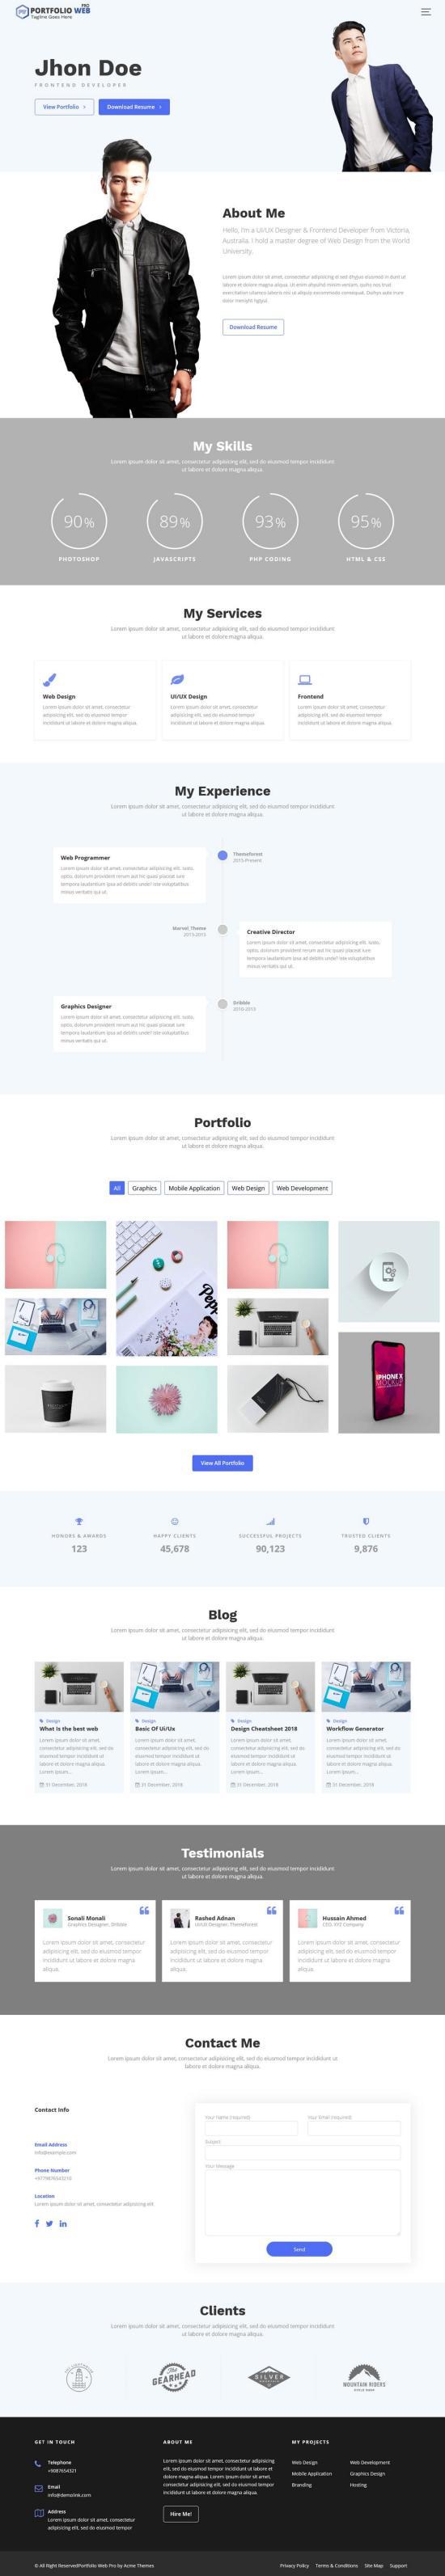 portfolio web pro wordpress theme 01 - Portfolio Web Pro WordPress Theme